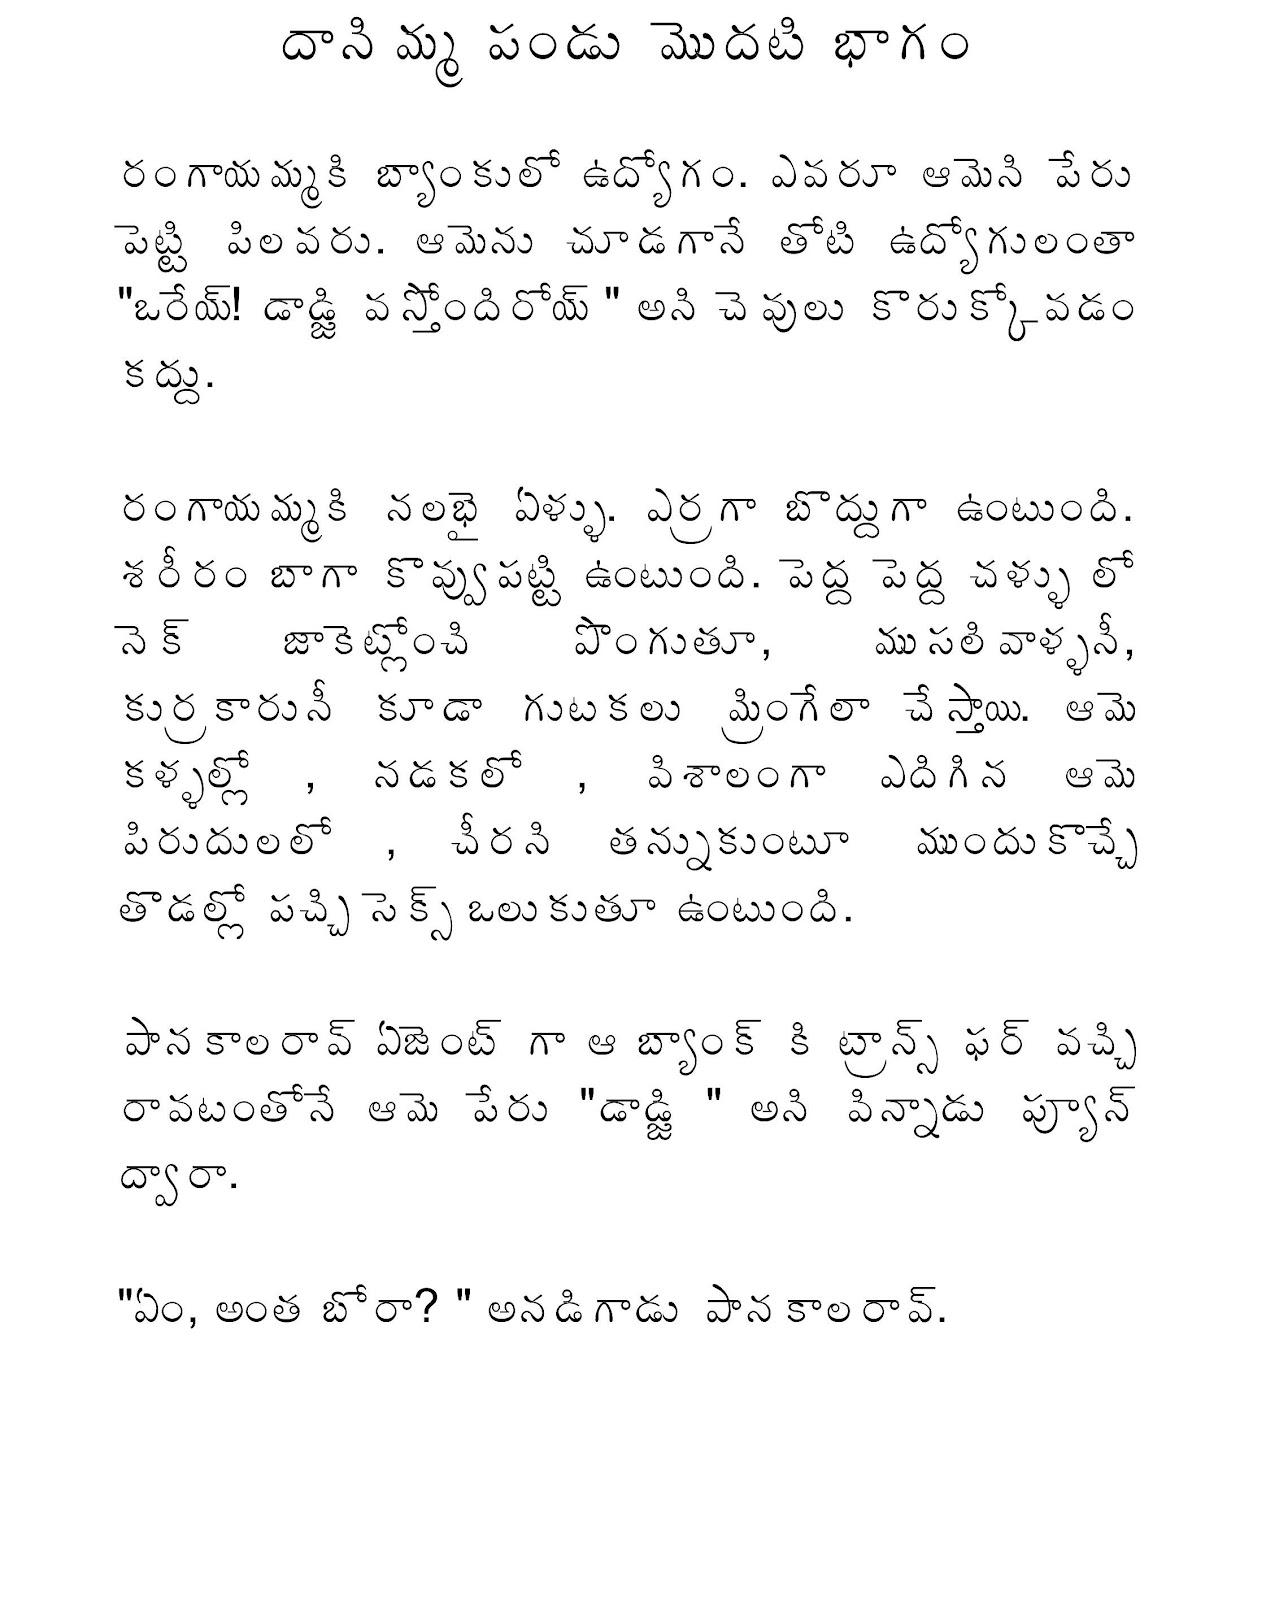 Telugu Srungara Boothu Kathalu Kanne Pillalu Ragile Manasulu Pooku